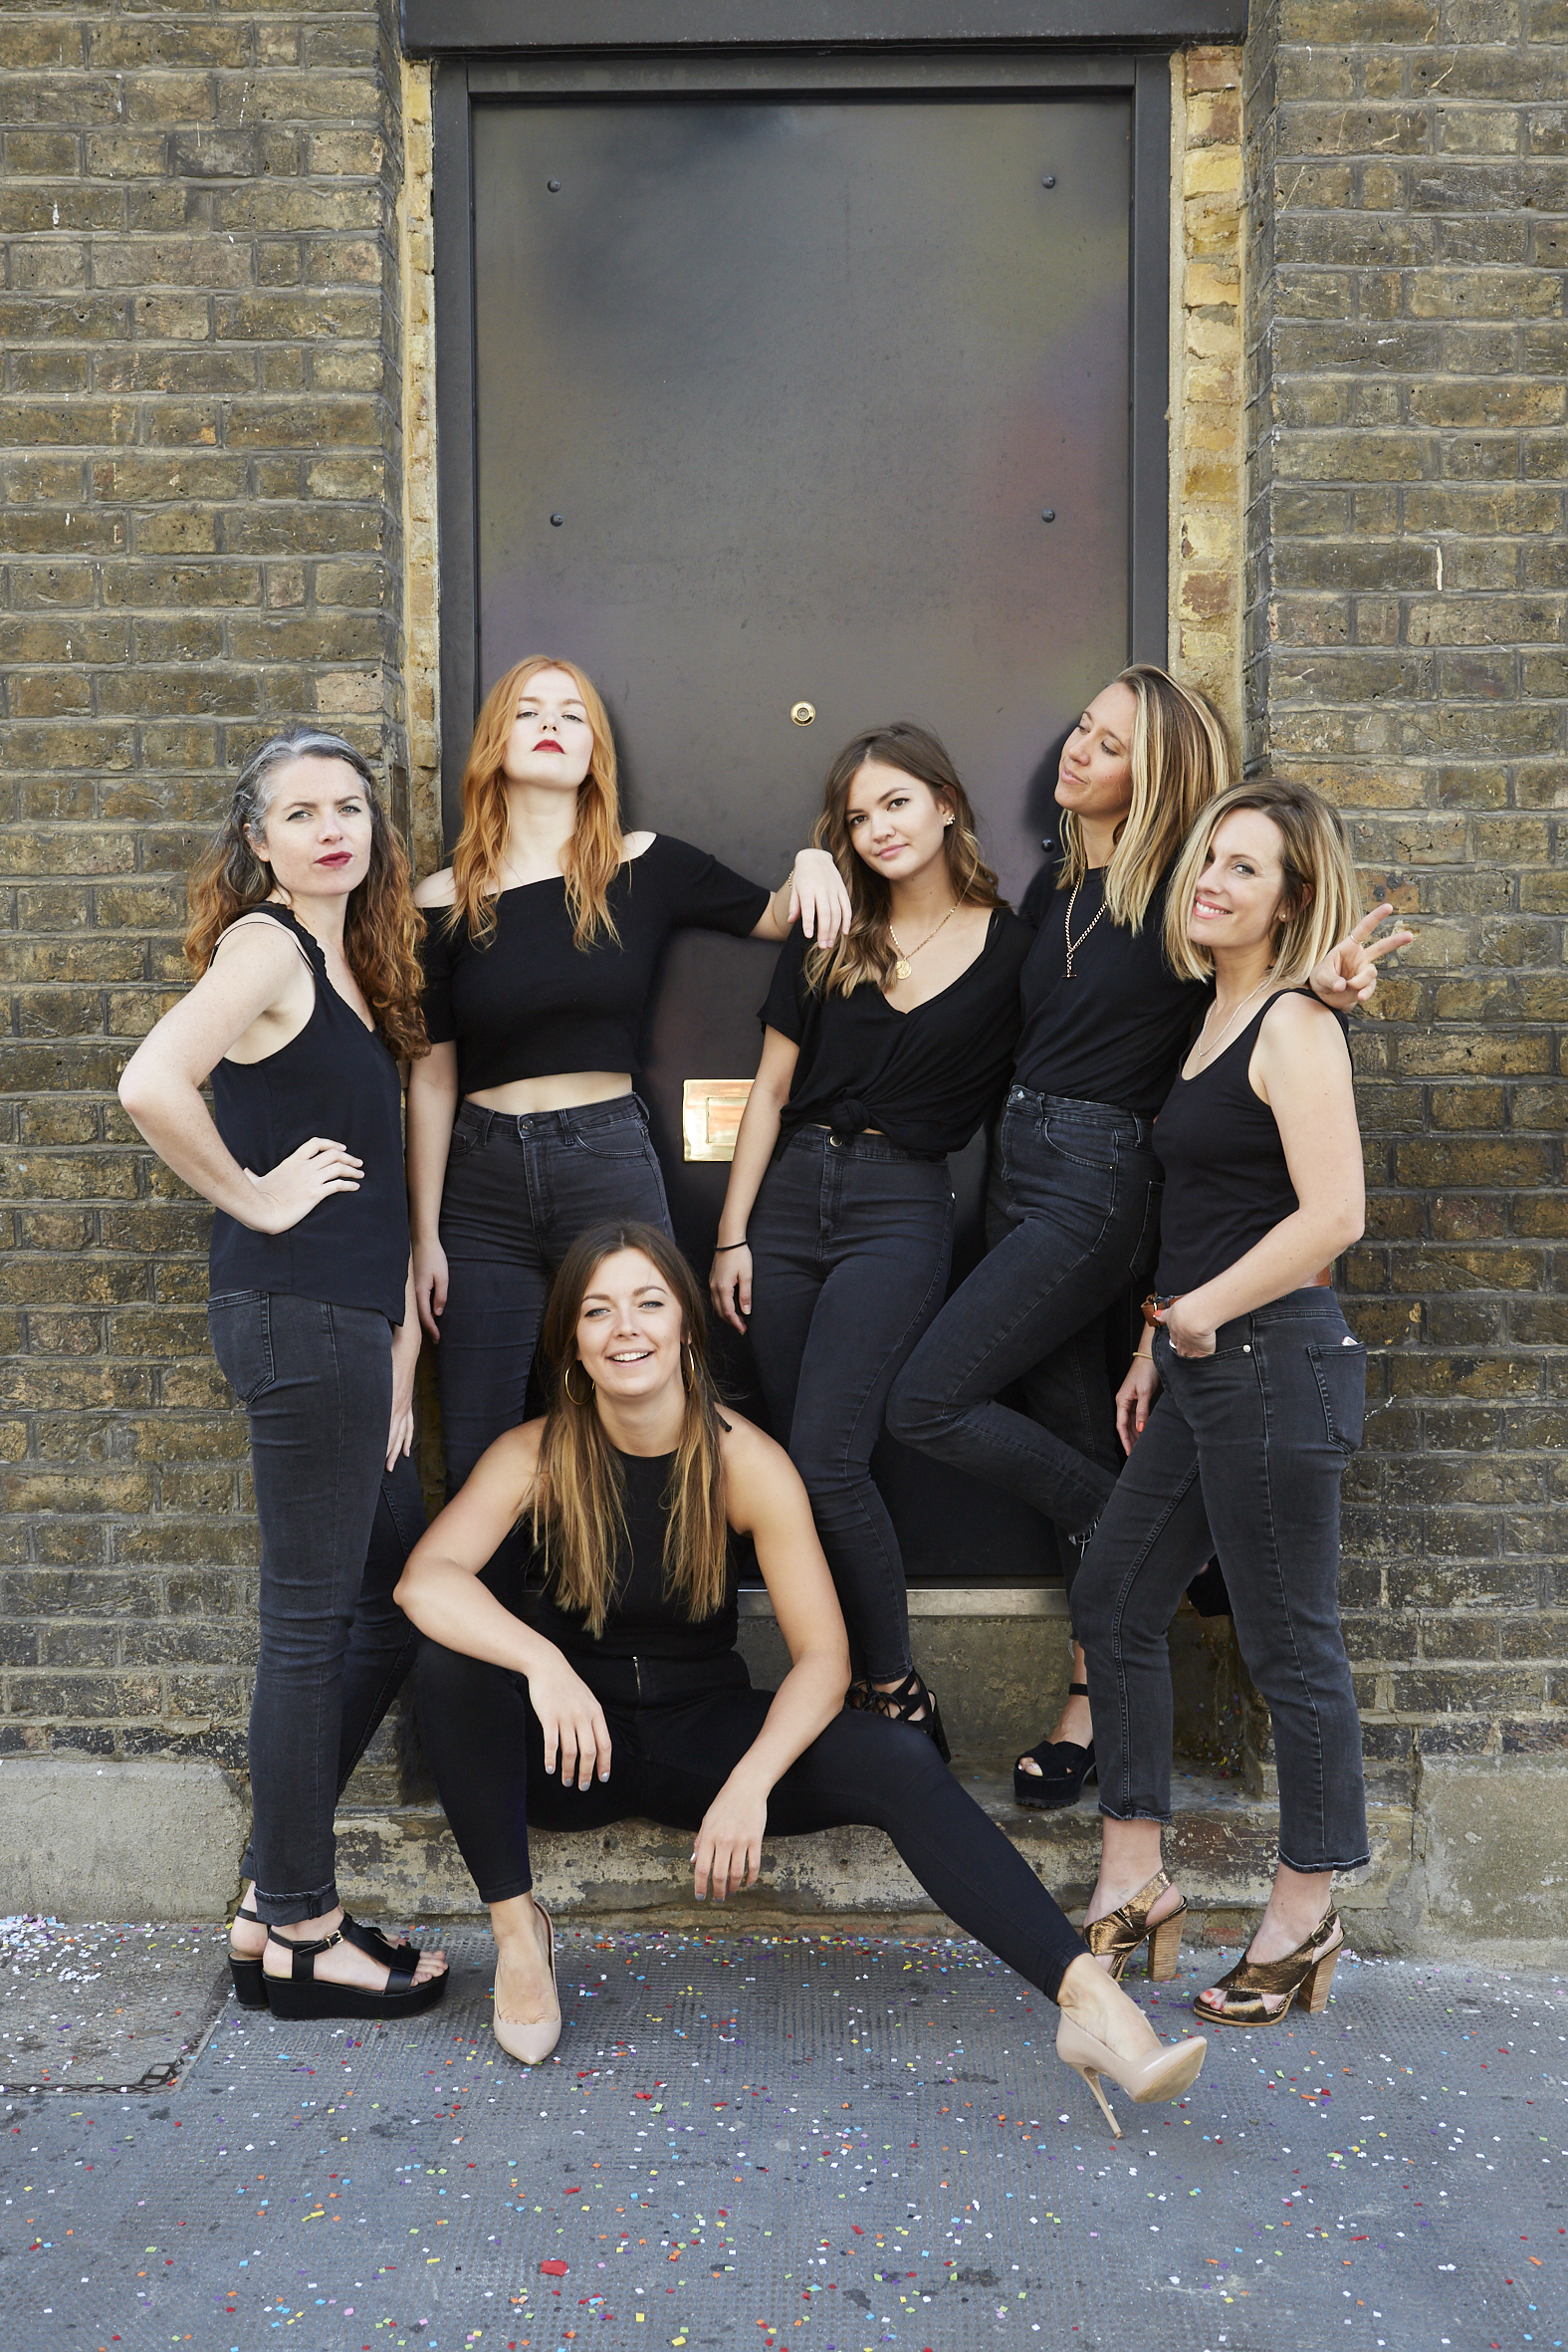 The Meringue Girl Gang The Meringue Girls